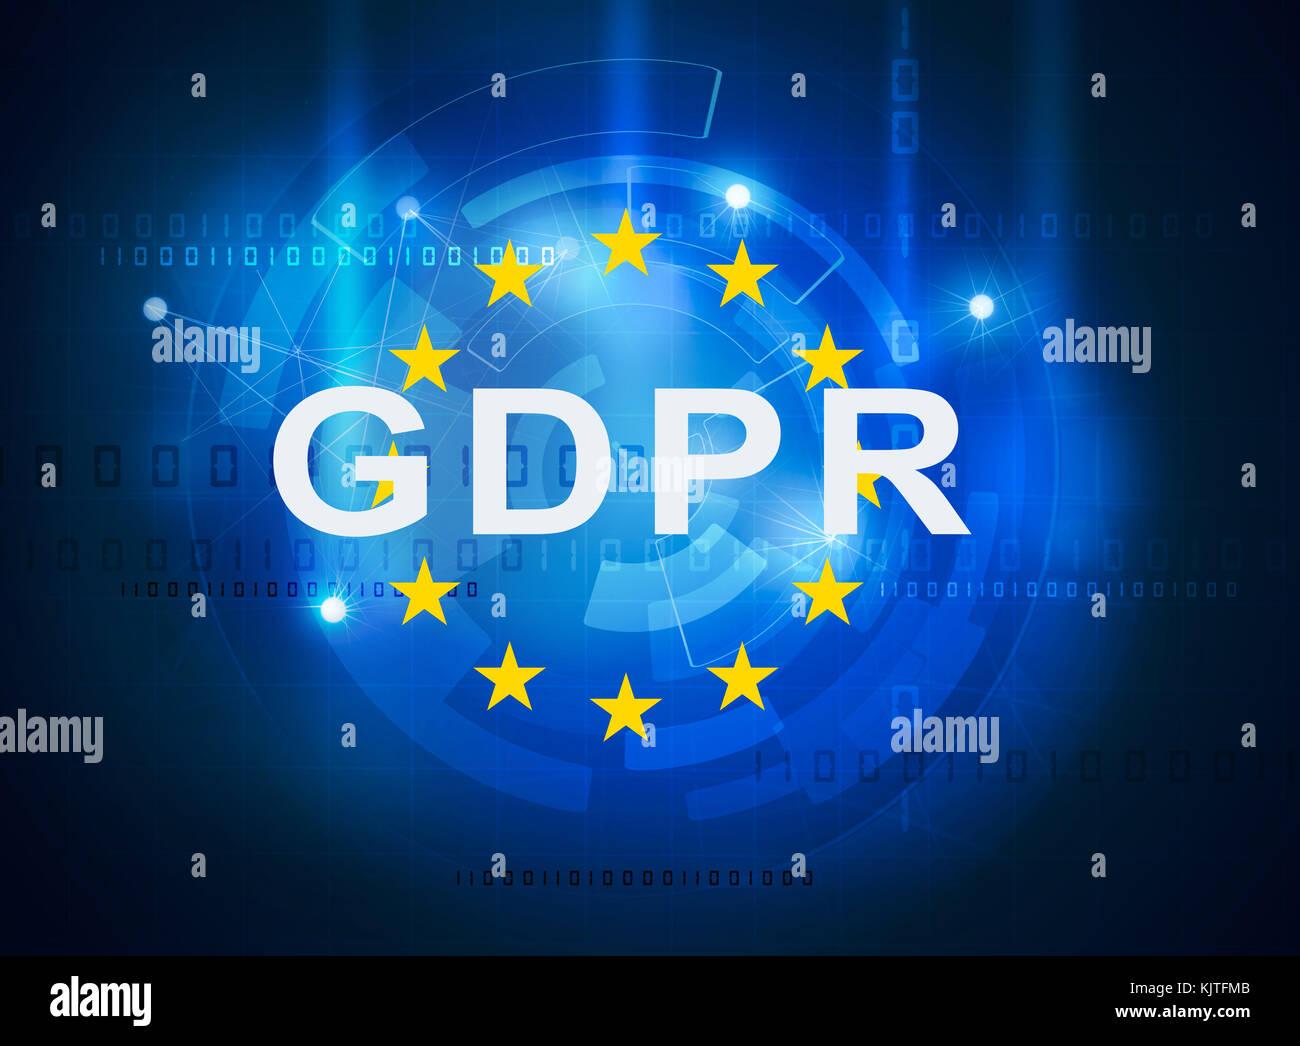 GDPR general data protection regulation - Stock Image